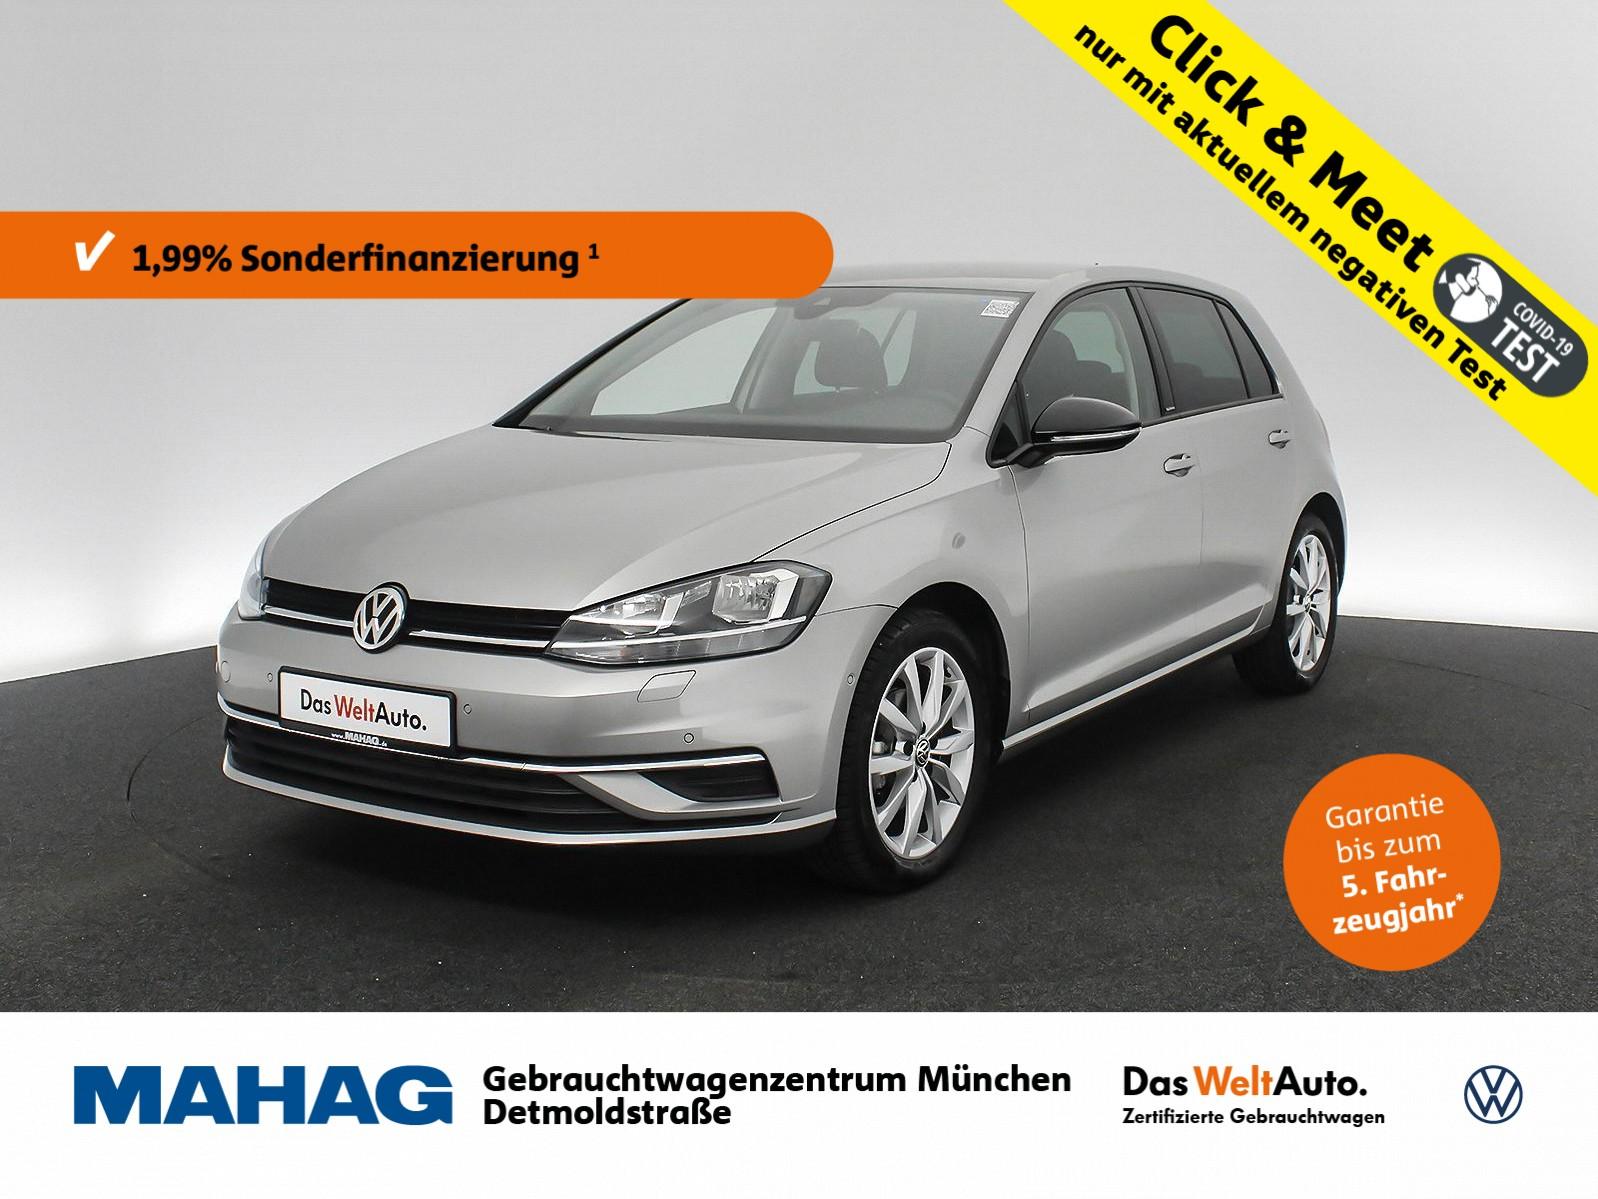 Volkswagen Golf VII 1.0 TSI IQ.DRIVE Navi Standhz. Sitzhz. ParkAssist LightAssist FrontAssist 17Zoll 6-Gang, Jahr 2019, Benzin